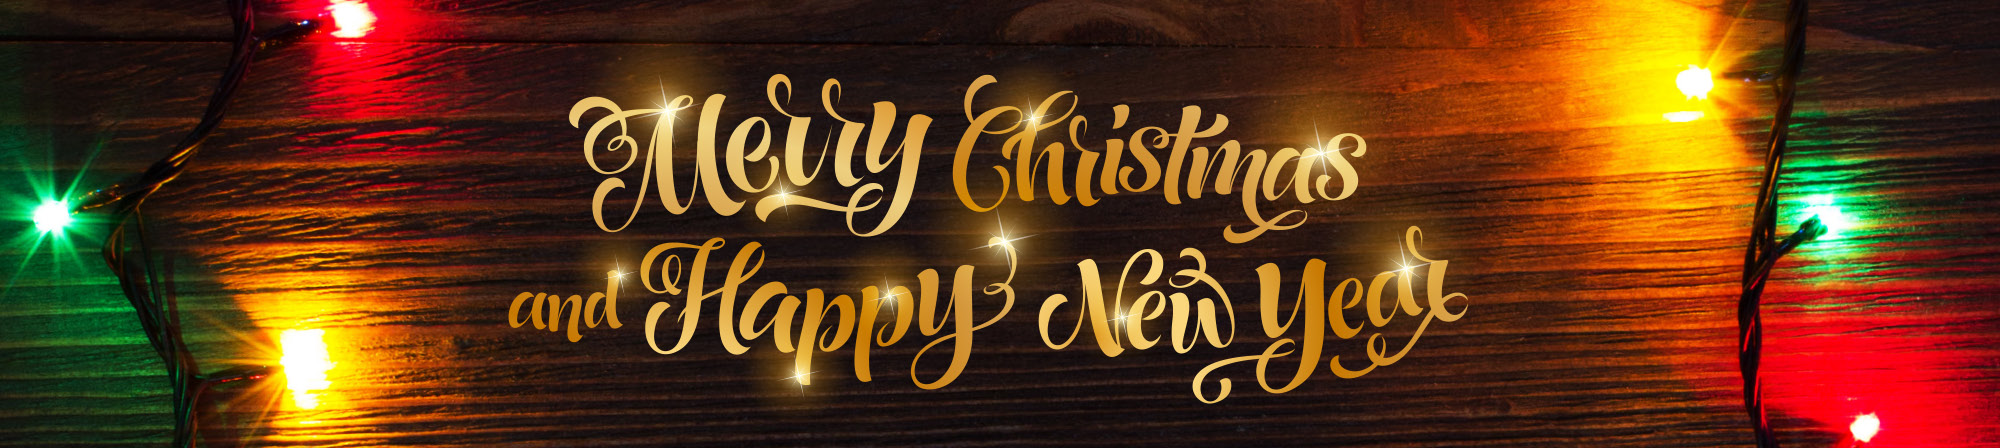 Merry-Xmas-New-Year-2016-Slide-2000x448